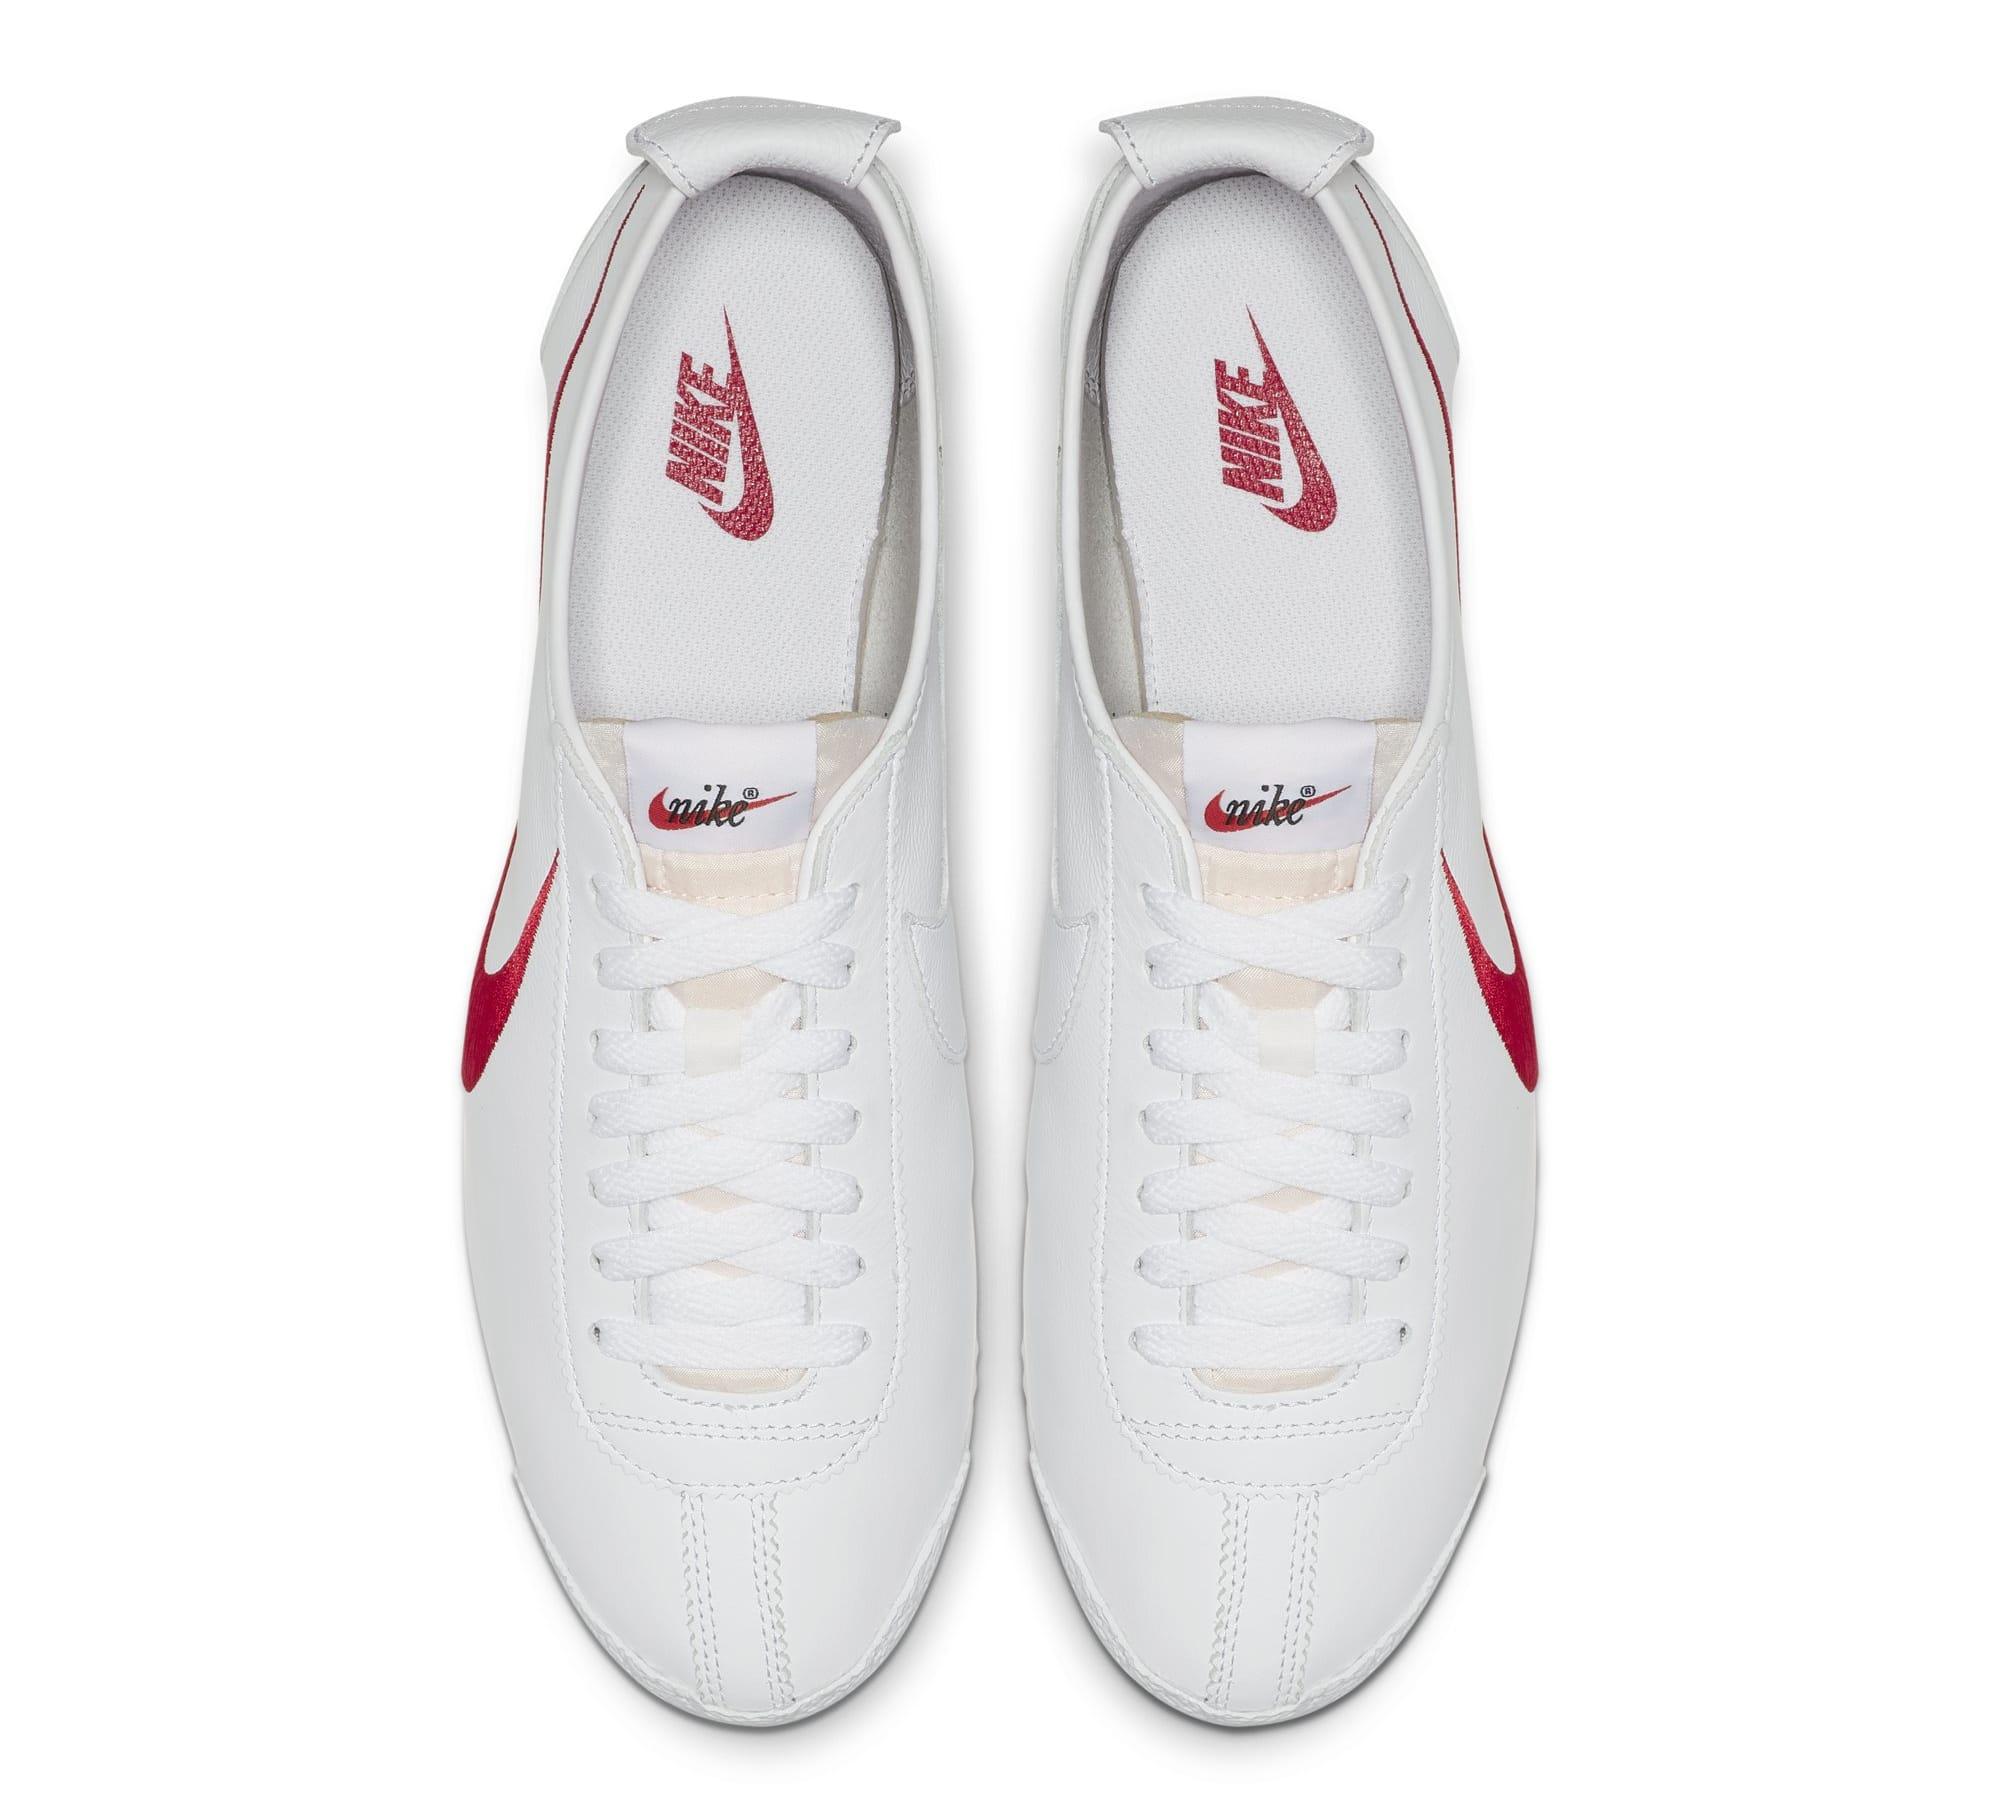 9d374df6532 Image via Nike Nike Classic Cortez 'Shoe Dog Pack (Swoosh)' CJ2586-100 (Top